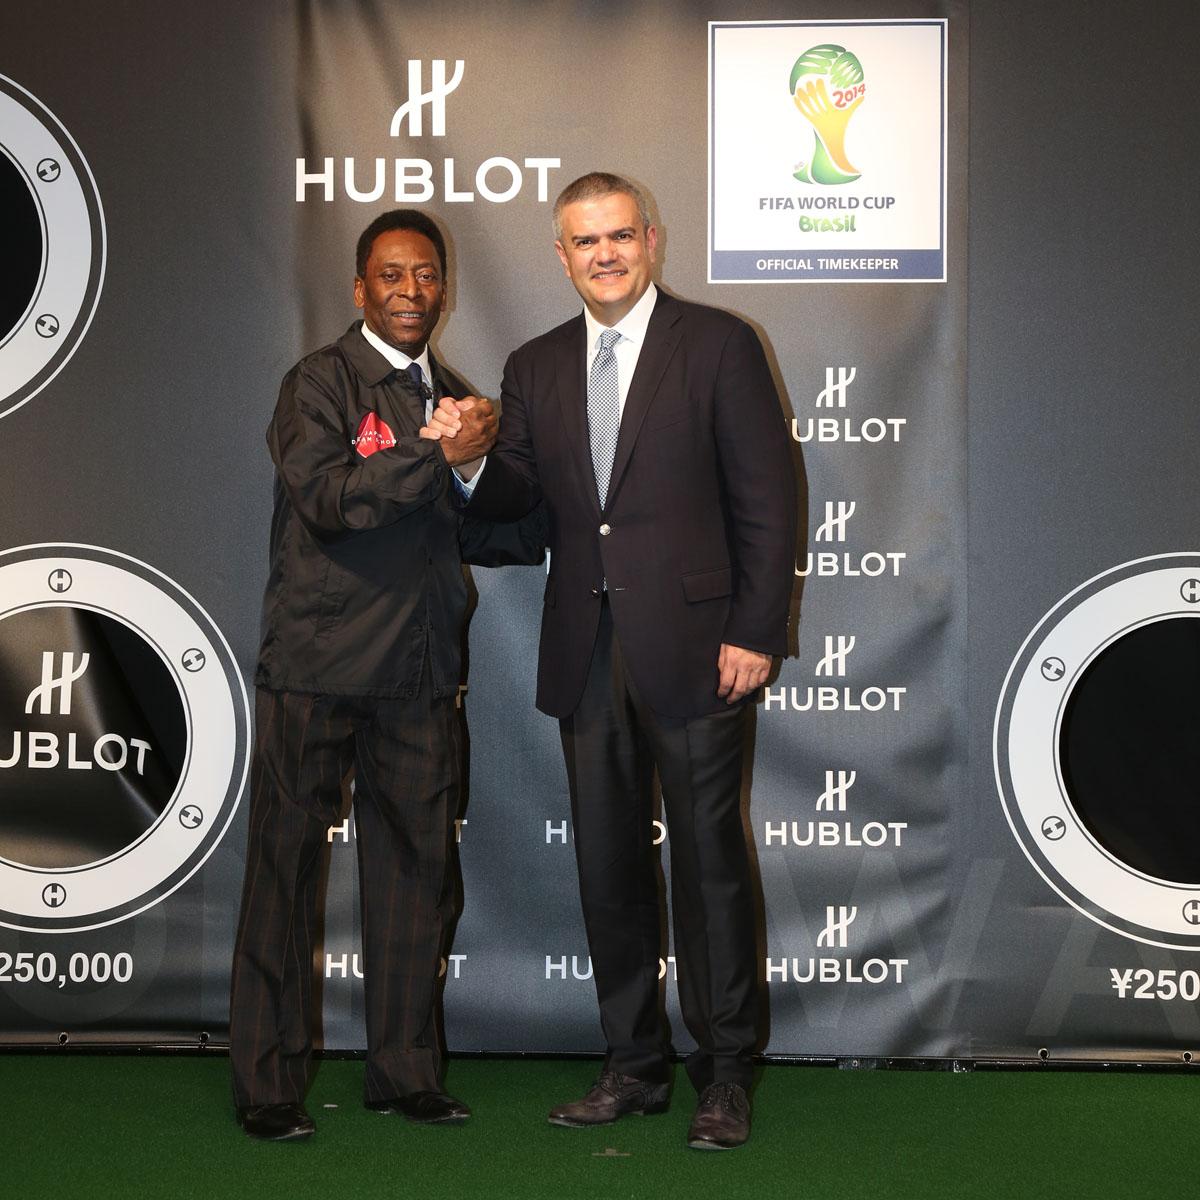 La Cote des Montres : Photo - Hublot Big Bang Unico Chrono Bi-rétrograde FIFA, Brésil 2014™